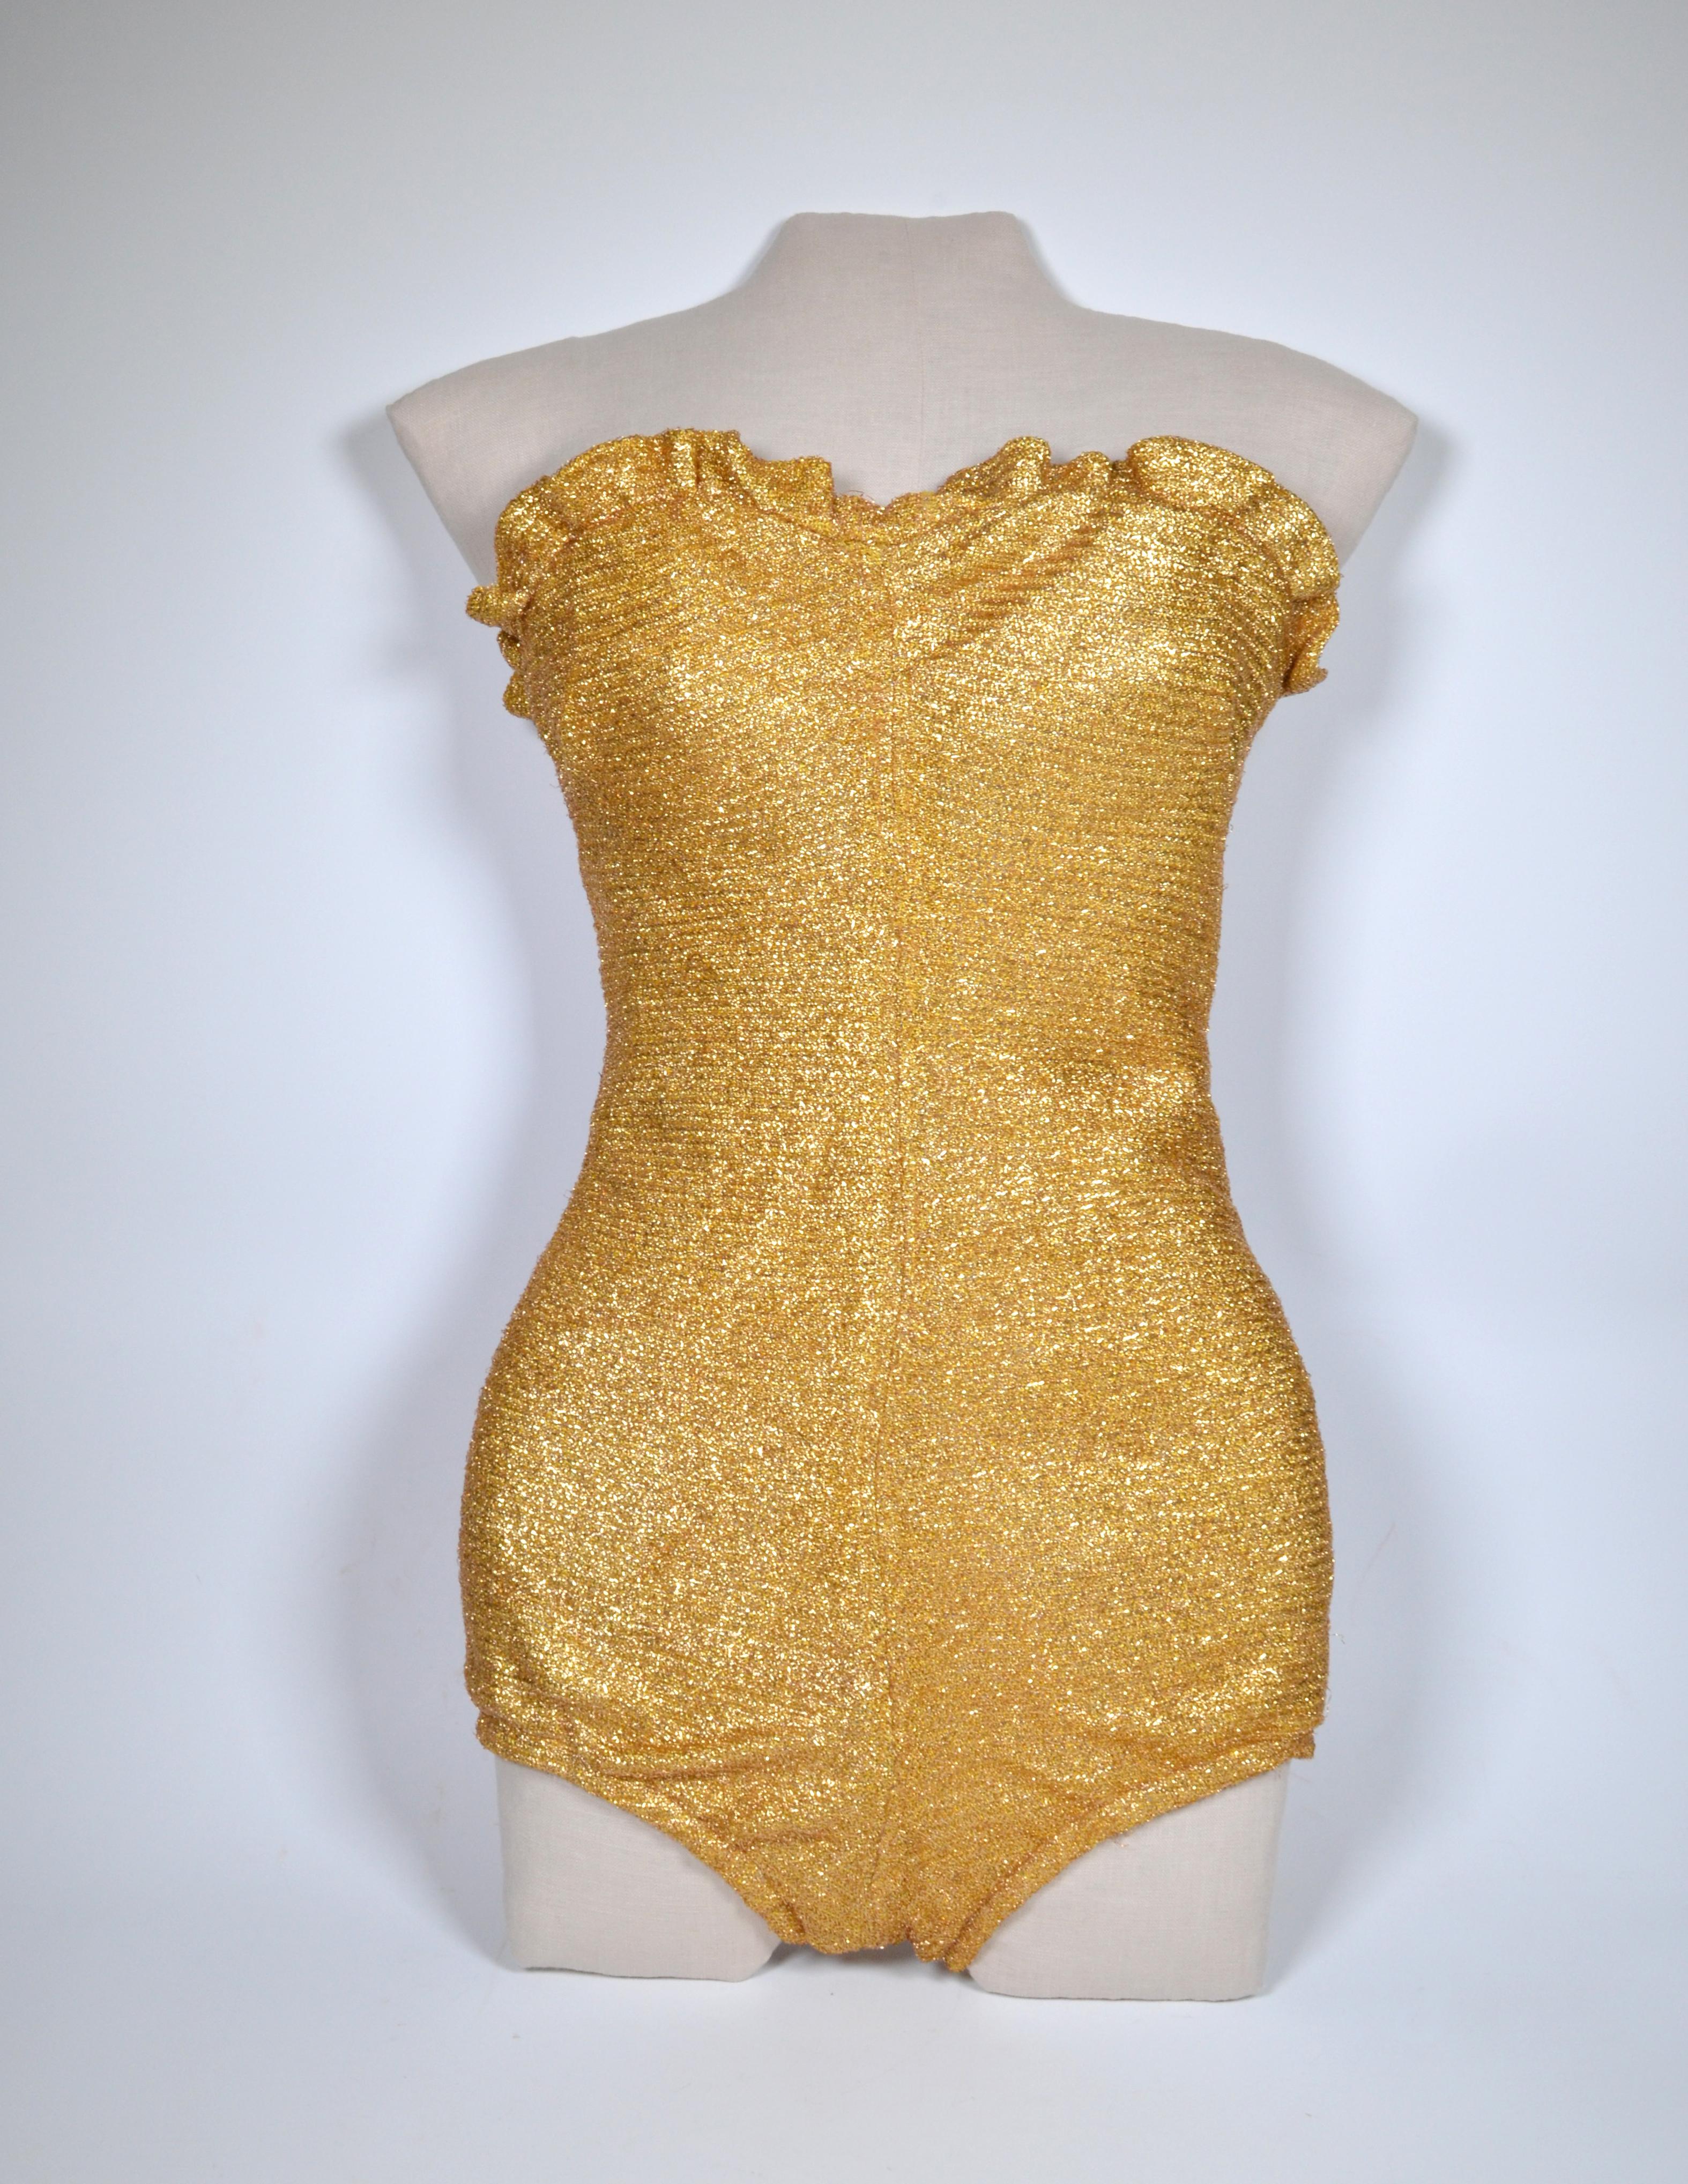 636ad3c8665d1 Hollywood fame[edit]. Glittering Metallic Lamé Swimsuit